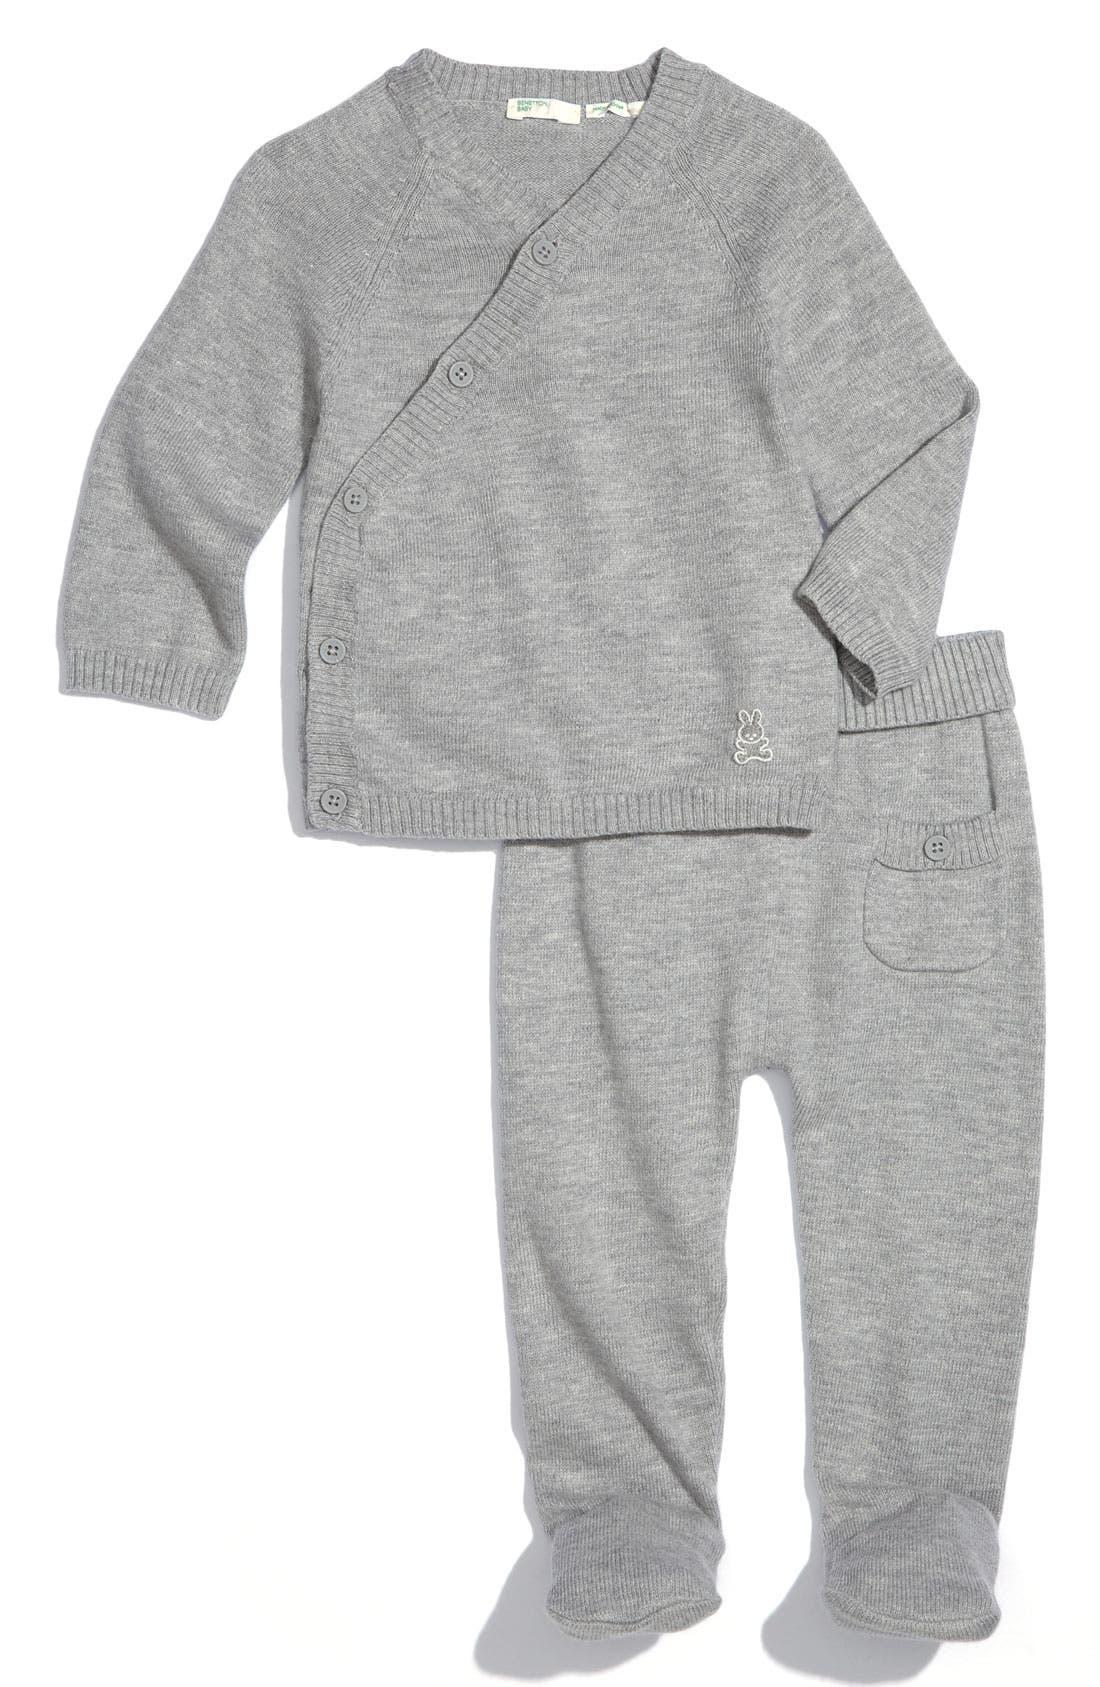 Main Image - United Colors of Benetton Kids Shirt & Pants Set (Infant)